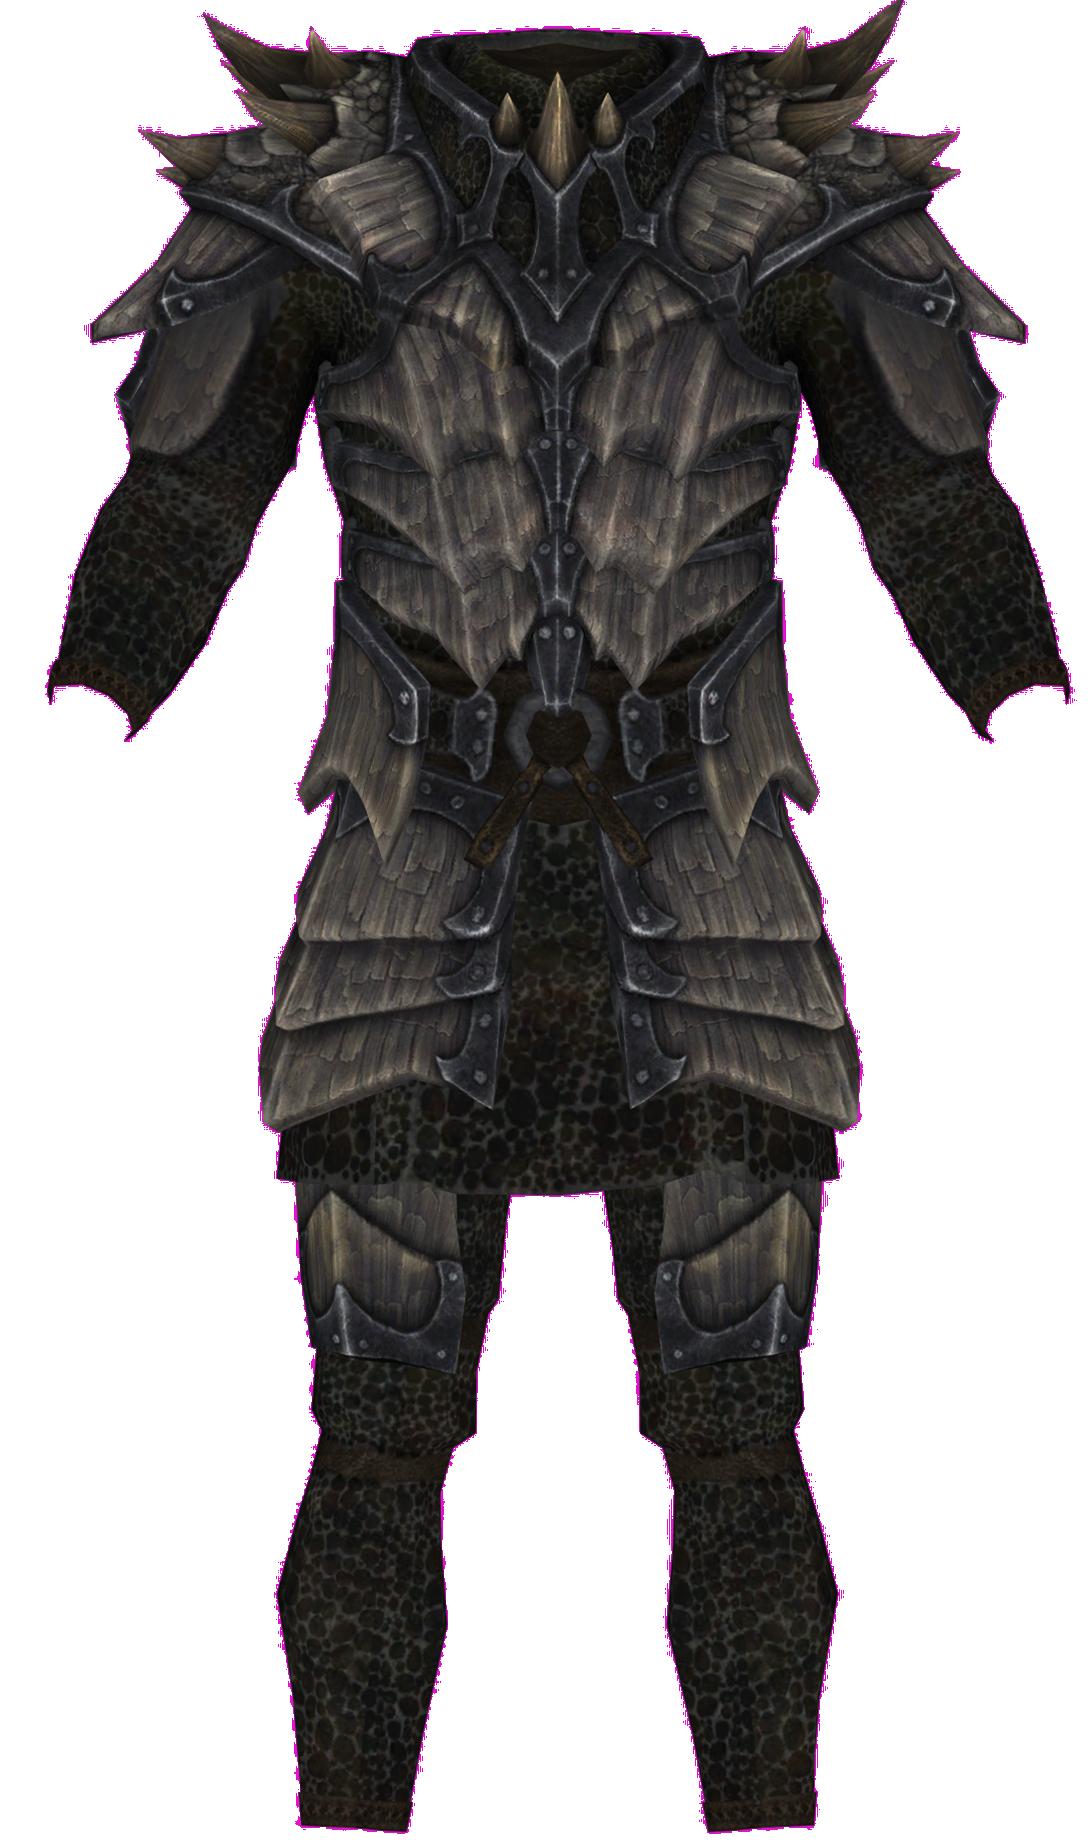 Dragonscale Armor Armor Piece Elder Scrolls Fandom Ragnarok rune scale viking armor dragon scale armor shoulder | etsy. dragonscale armor armor piece elder